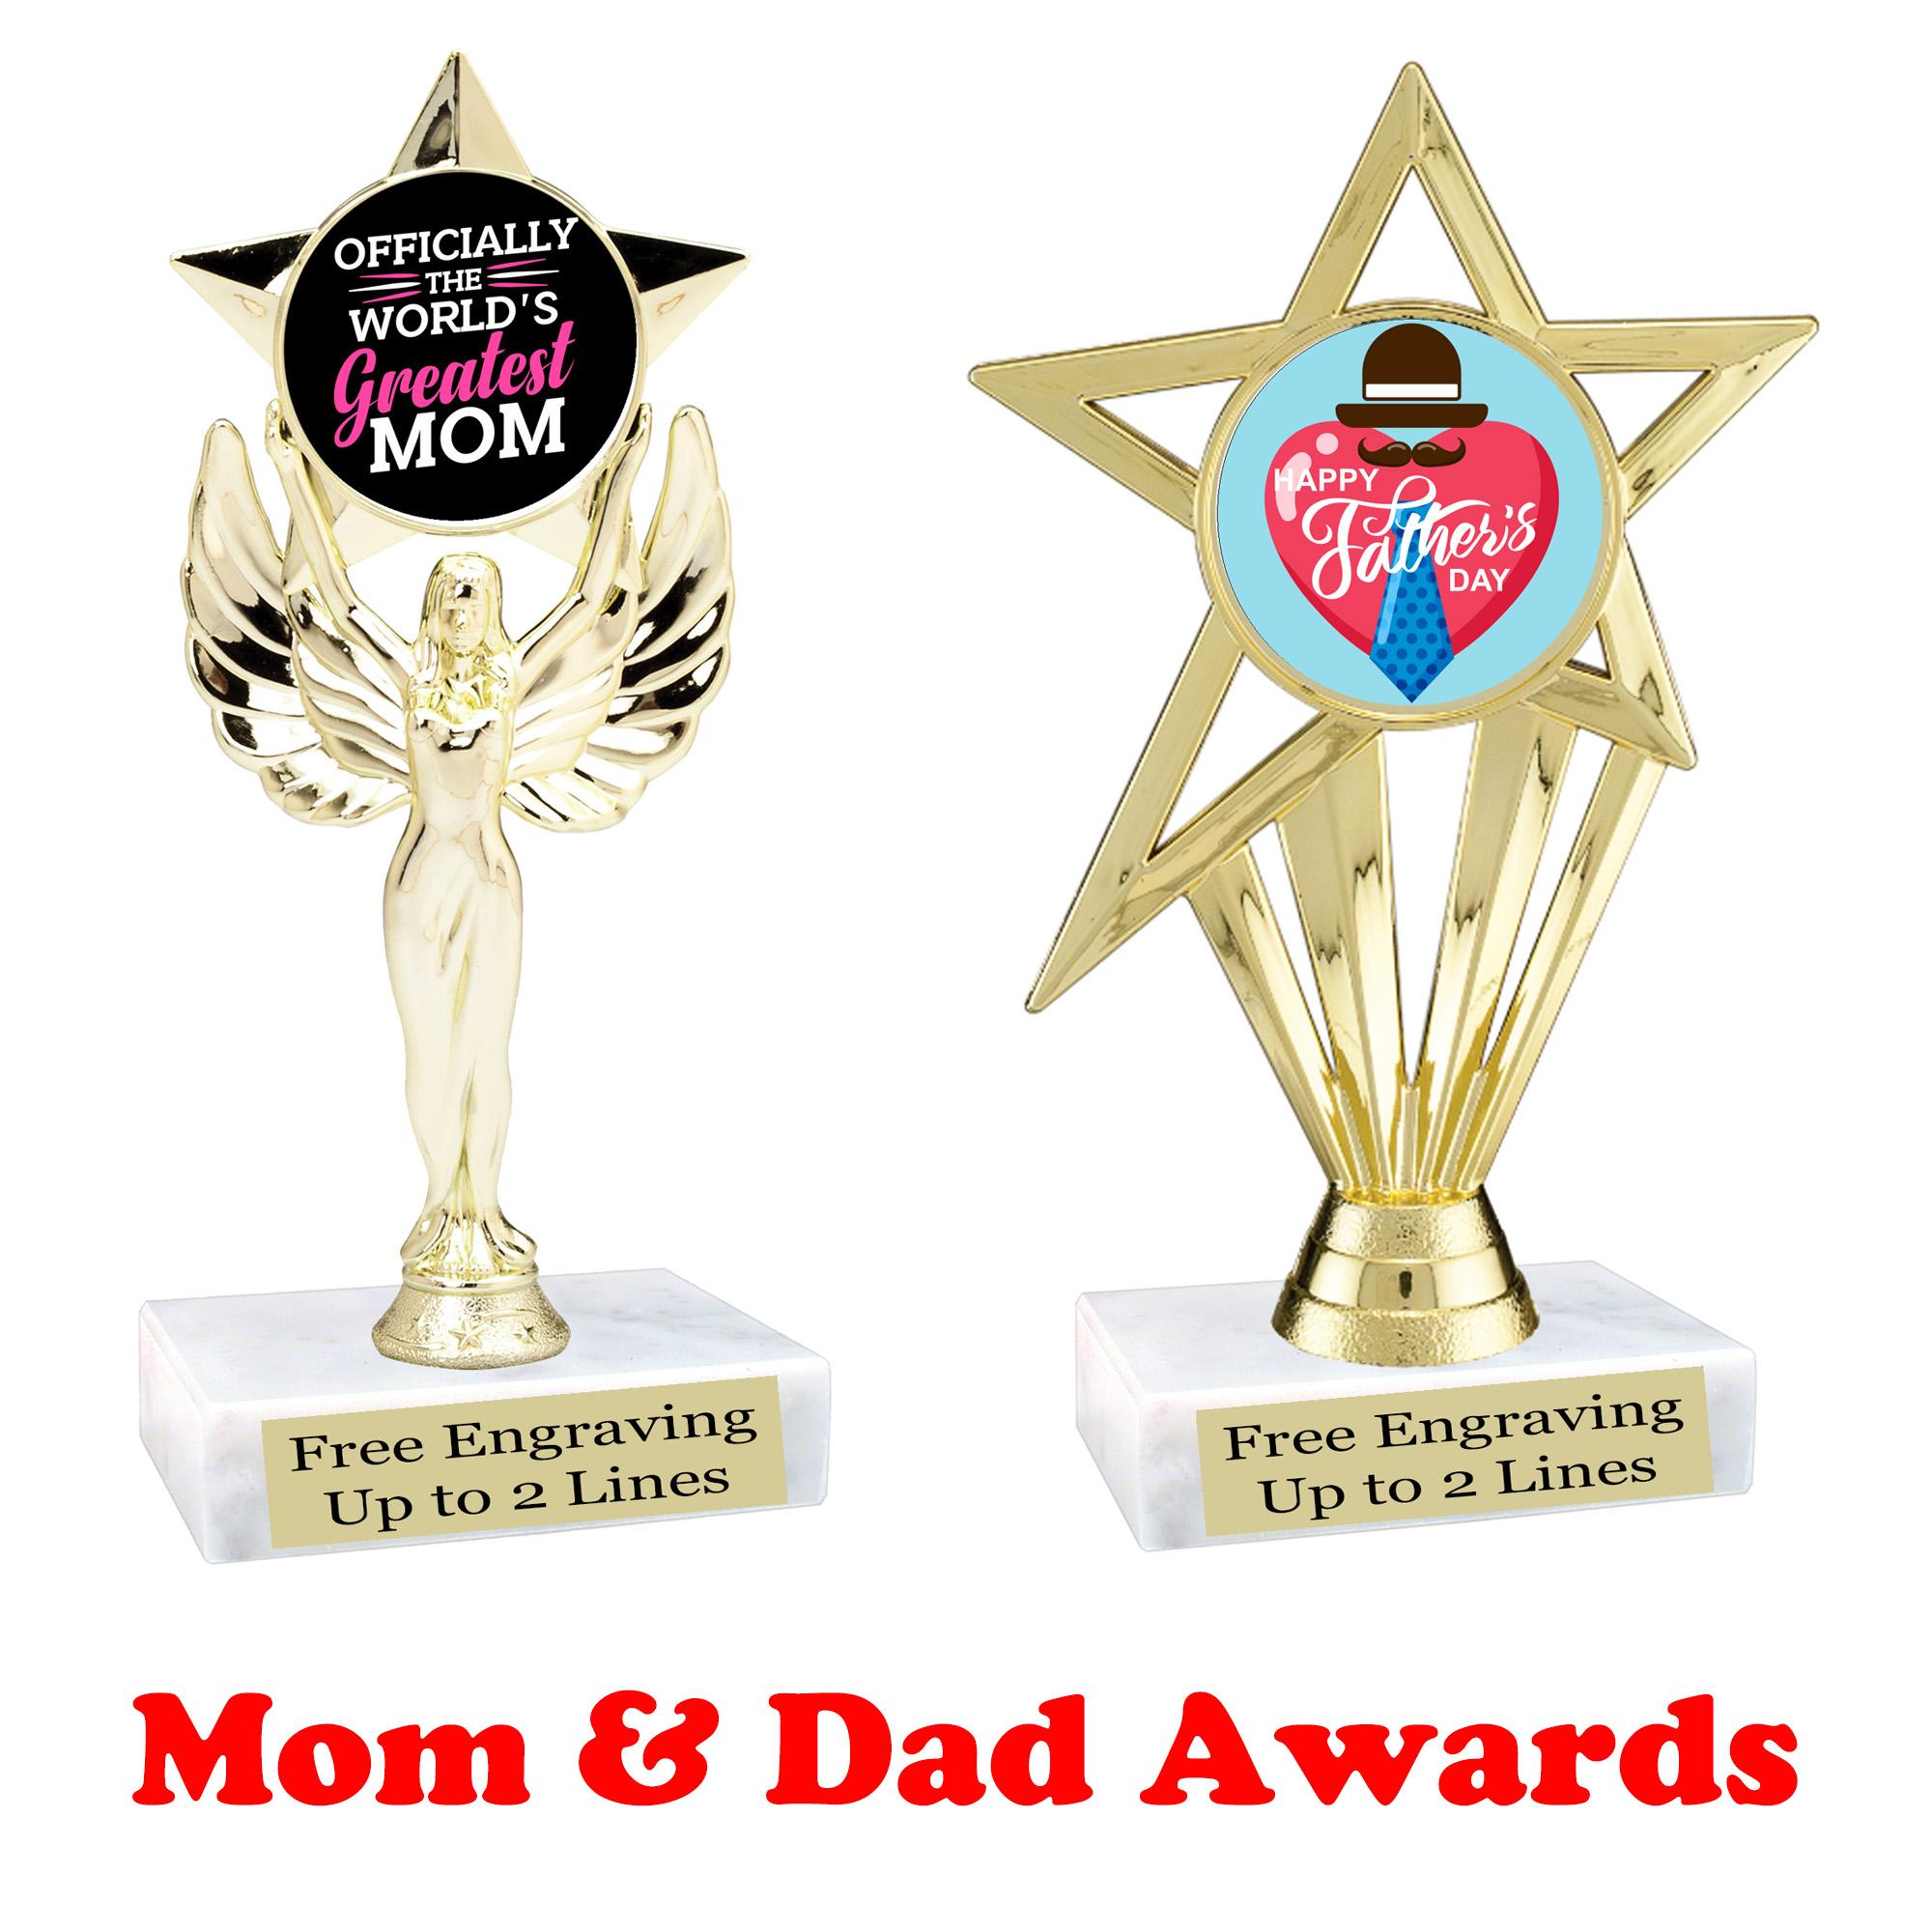 mom-and-dad-awards.jpg